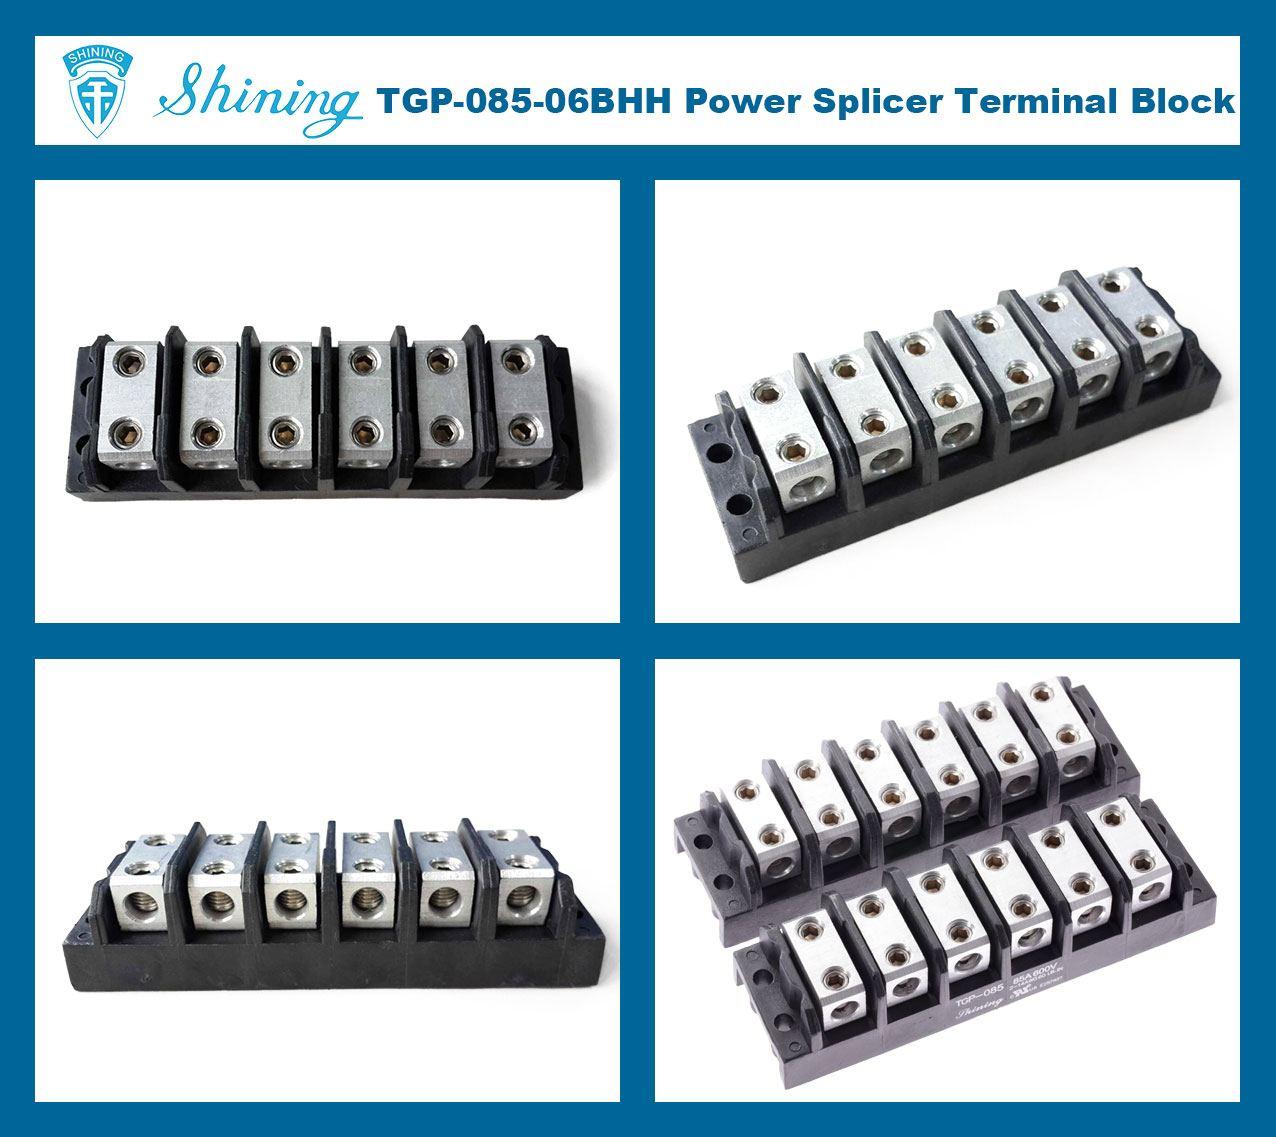 TGP-085-06BHH 600V 85A 6 Way Power Splicer Terminal Block